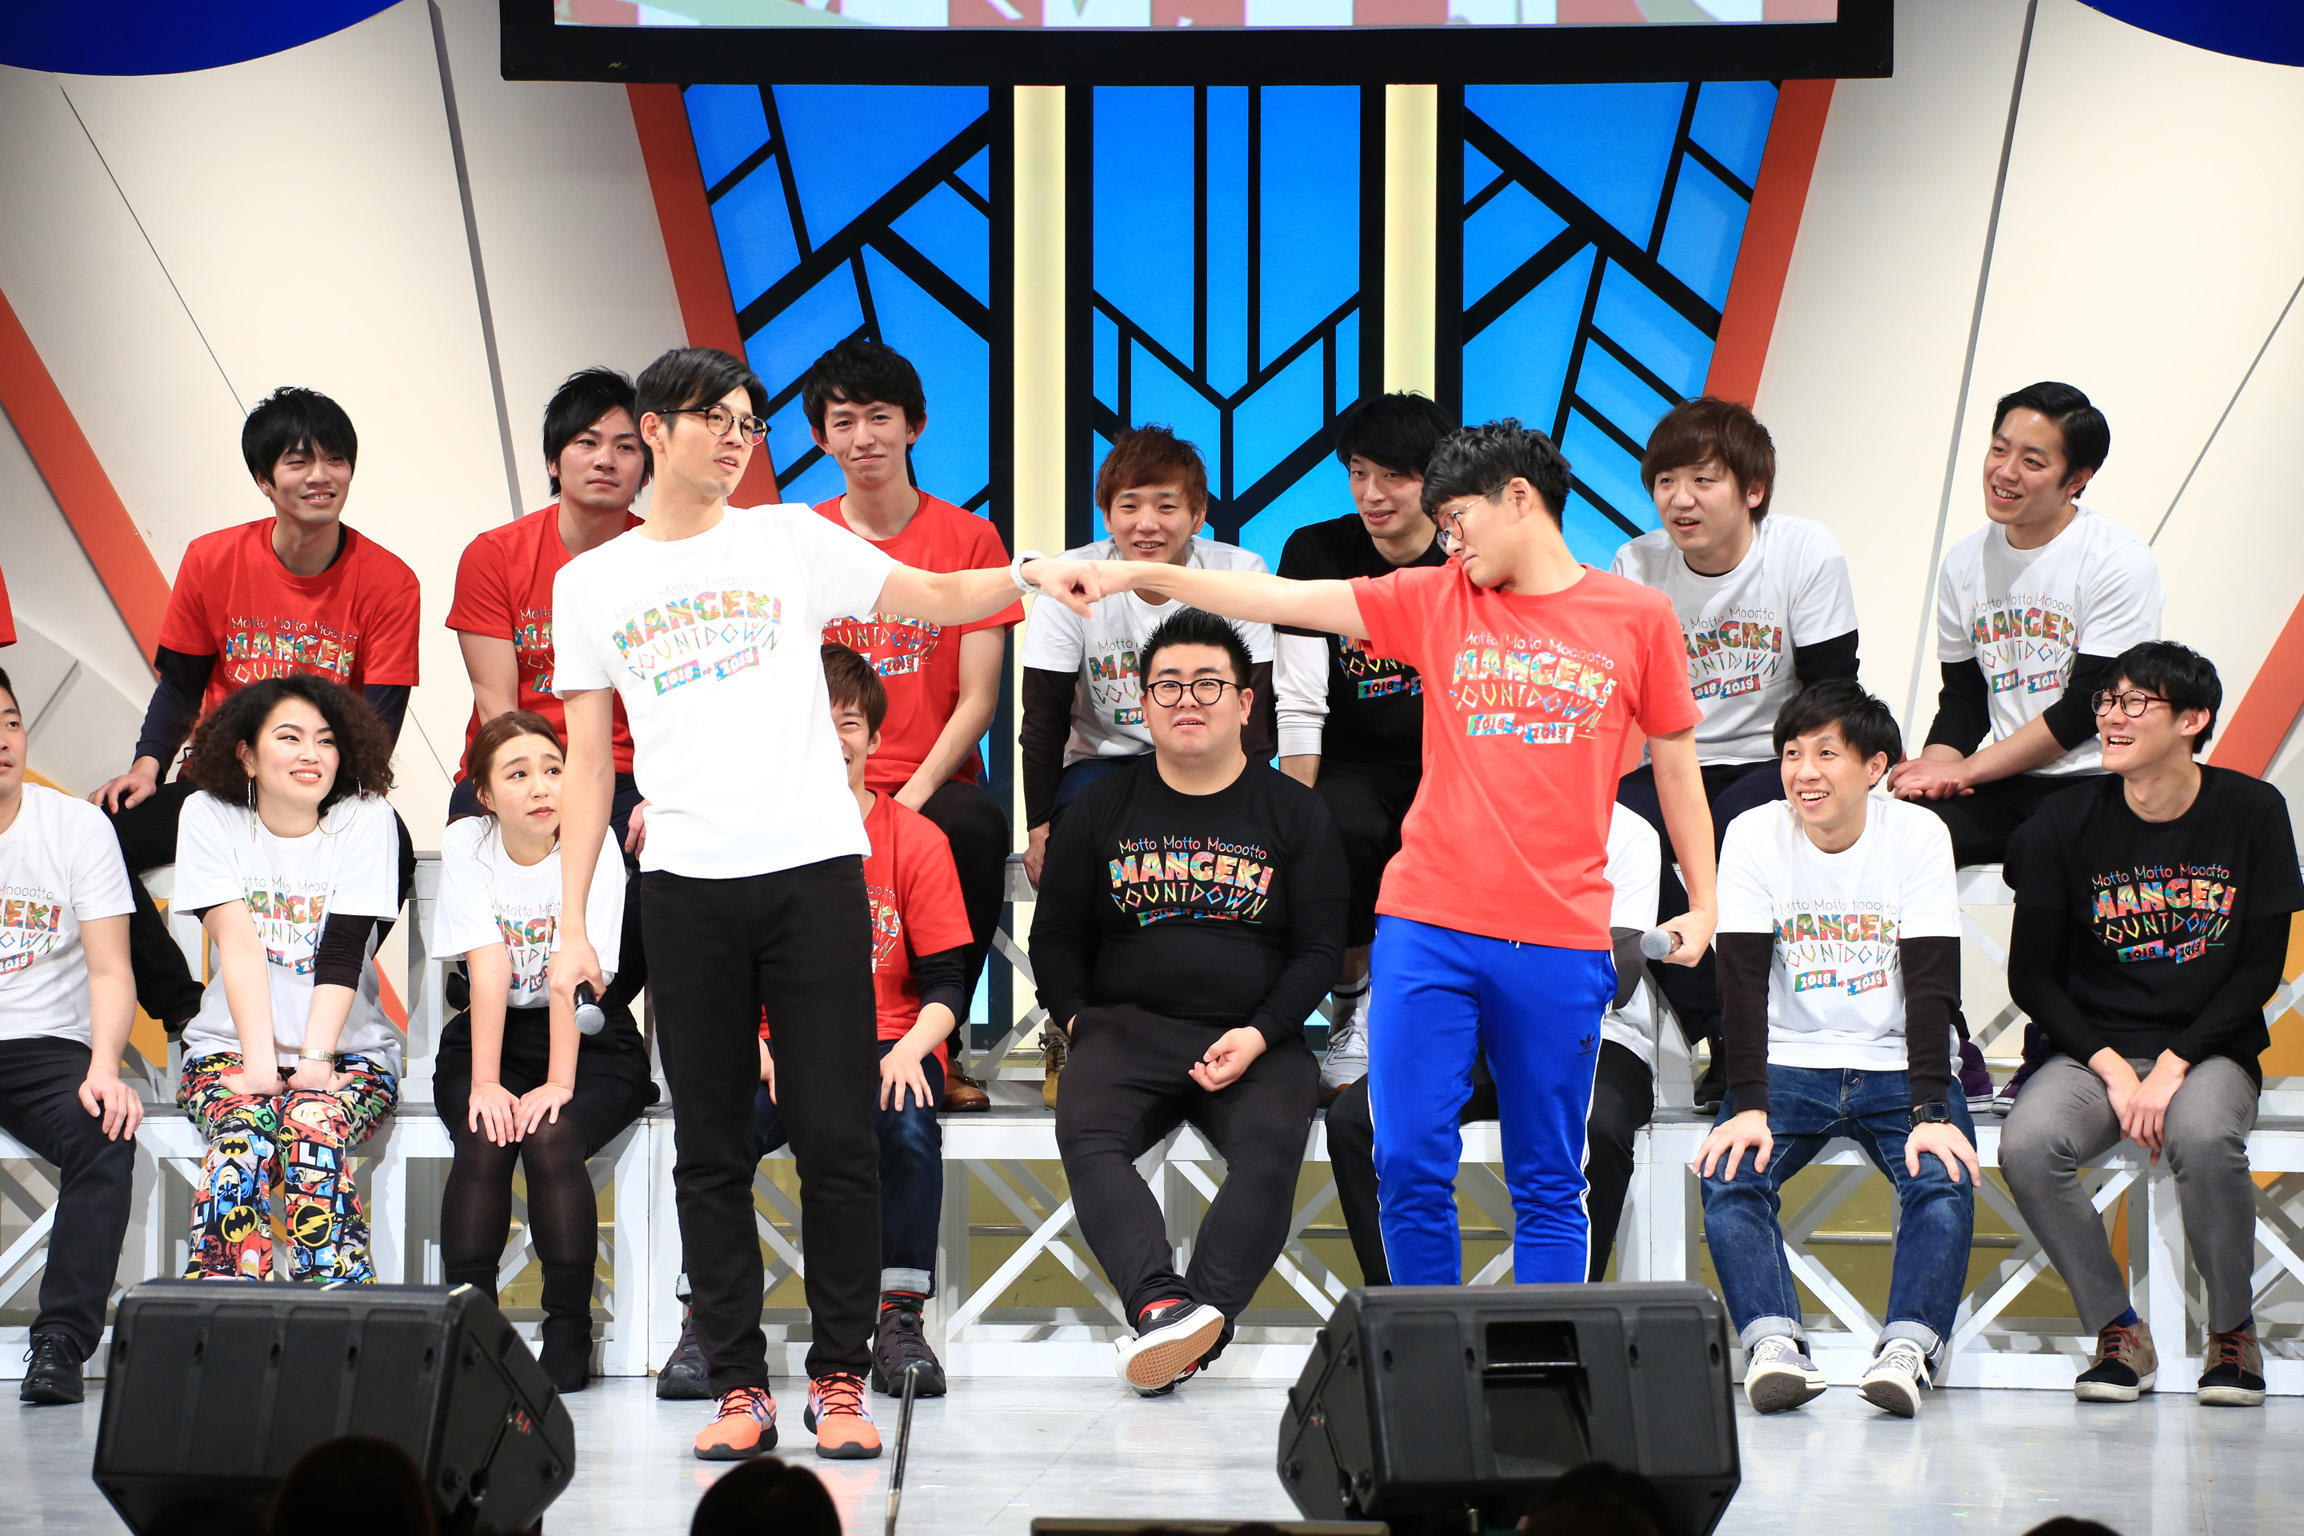 http://news.yoshimoto.co.jp/20190101105138-23689abdbeb8c8a5c2e6aecb33e6484708da9881.jpg